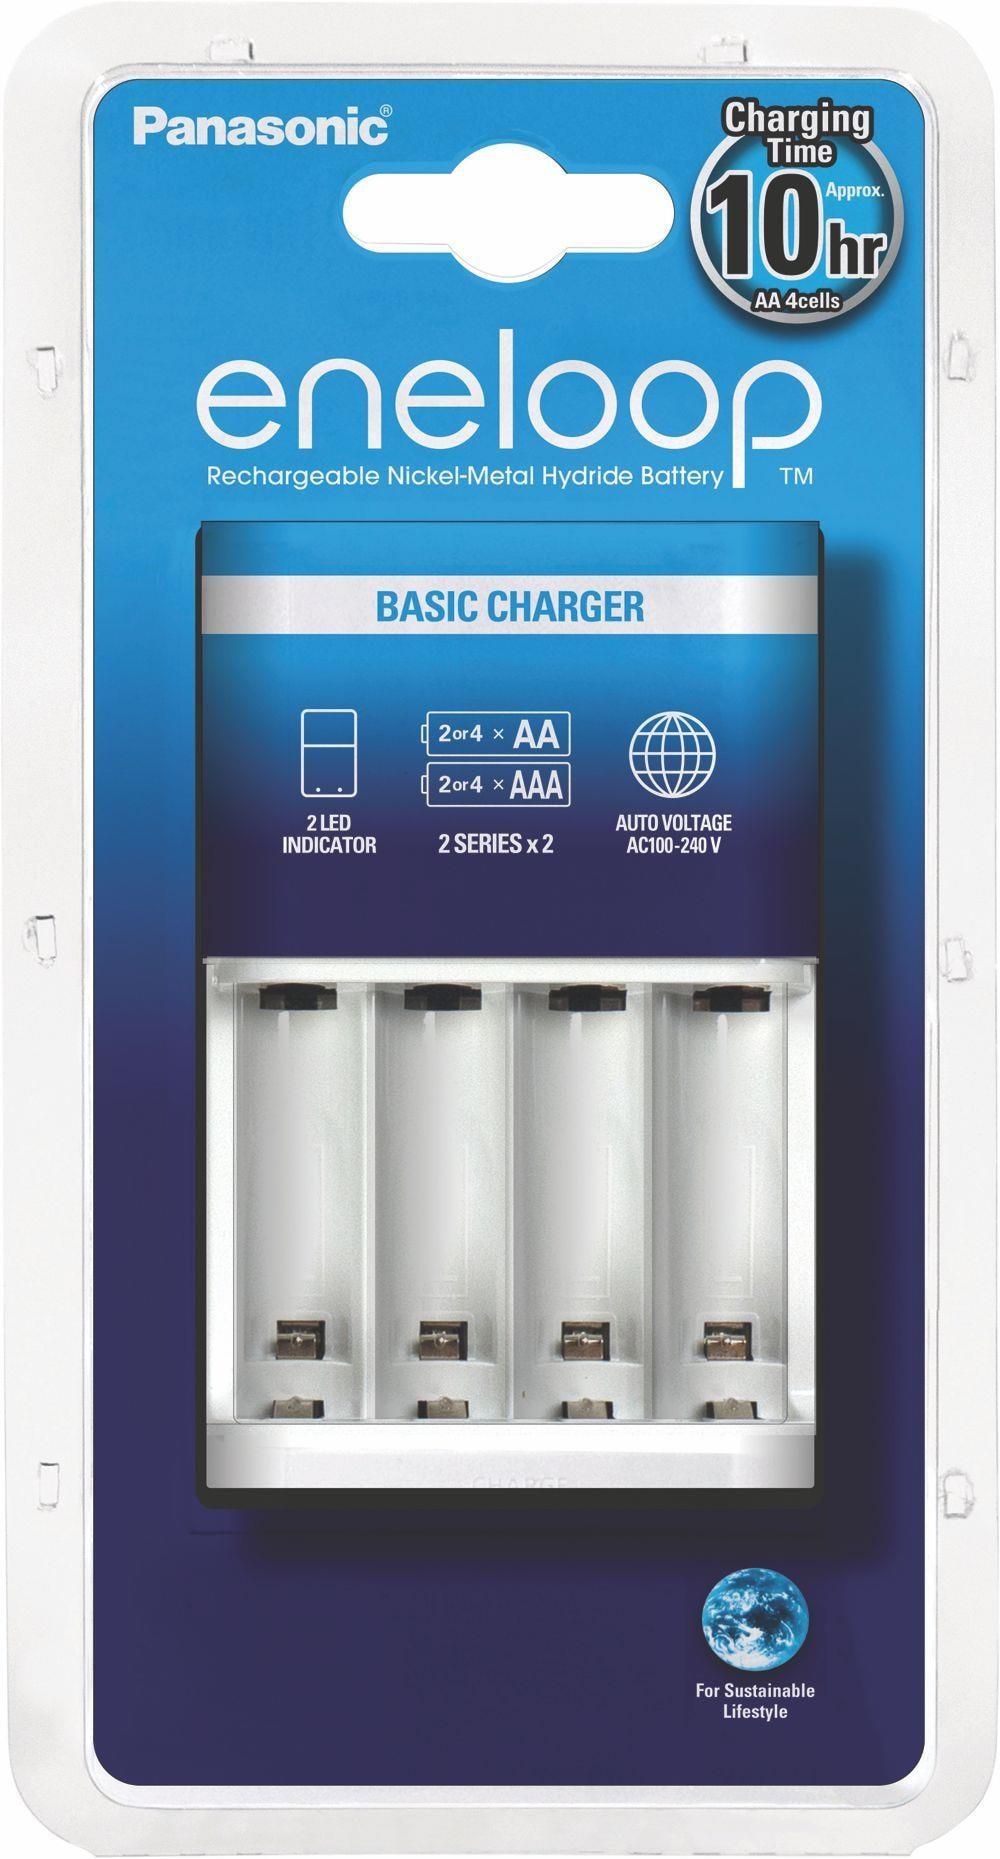 Ładowarka Eneloop Panasonic Basic Charger Bqcc51 Bez Akumulatorów - 1